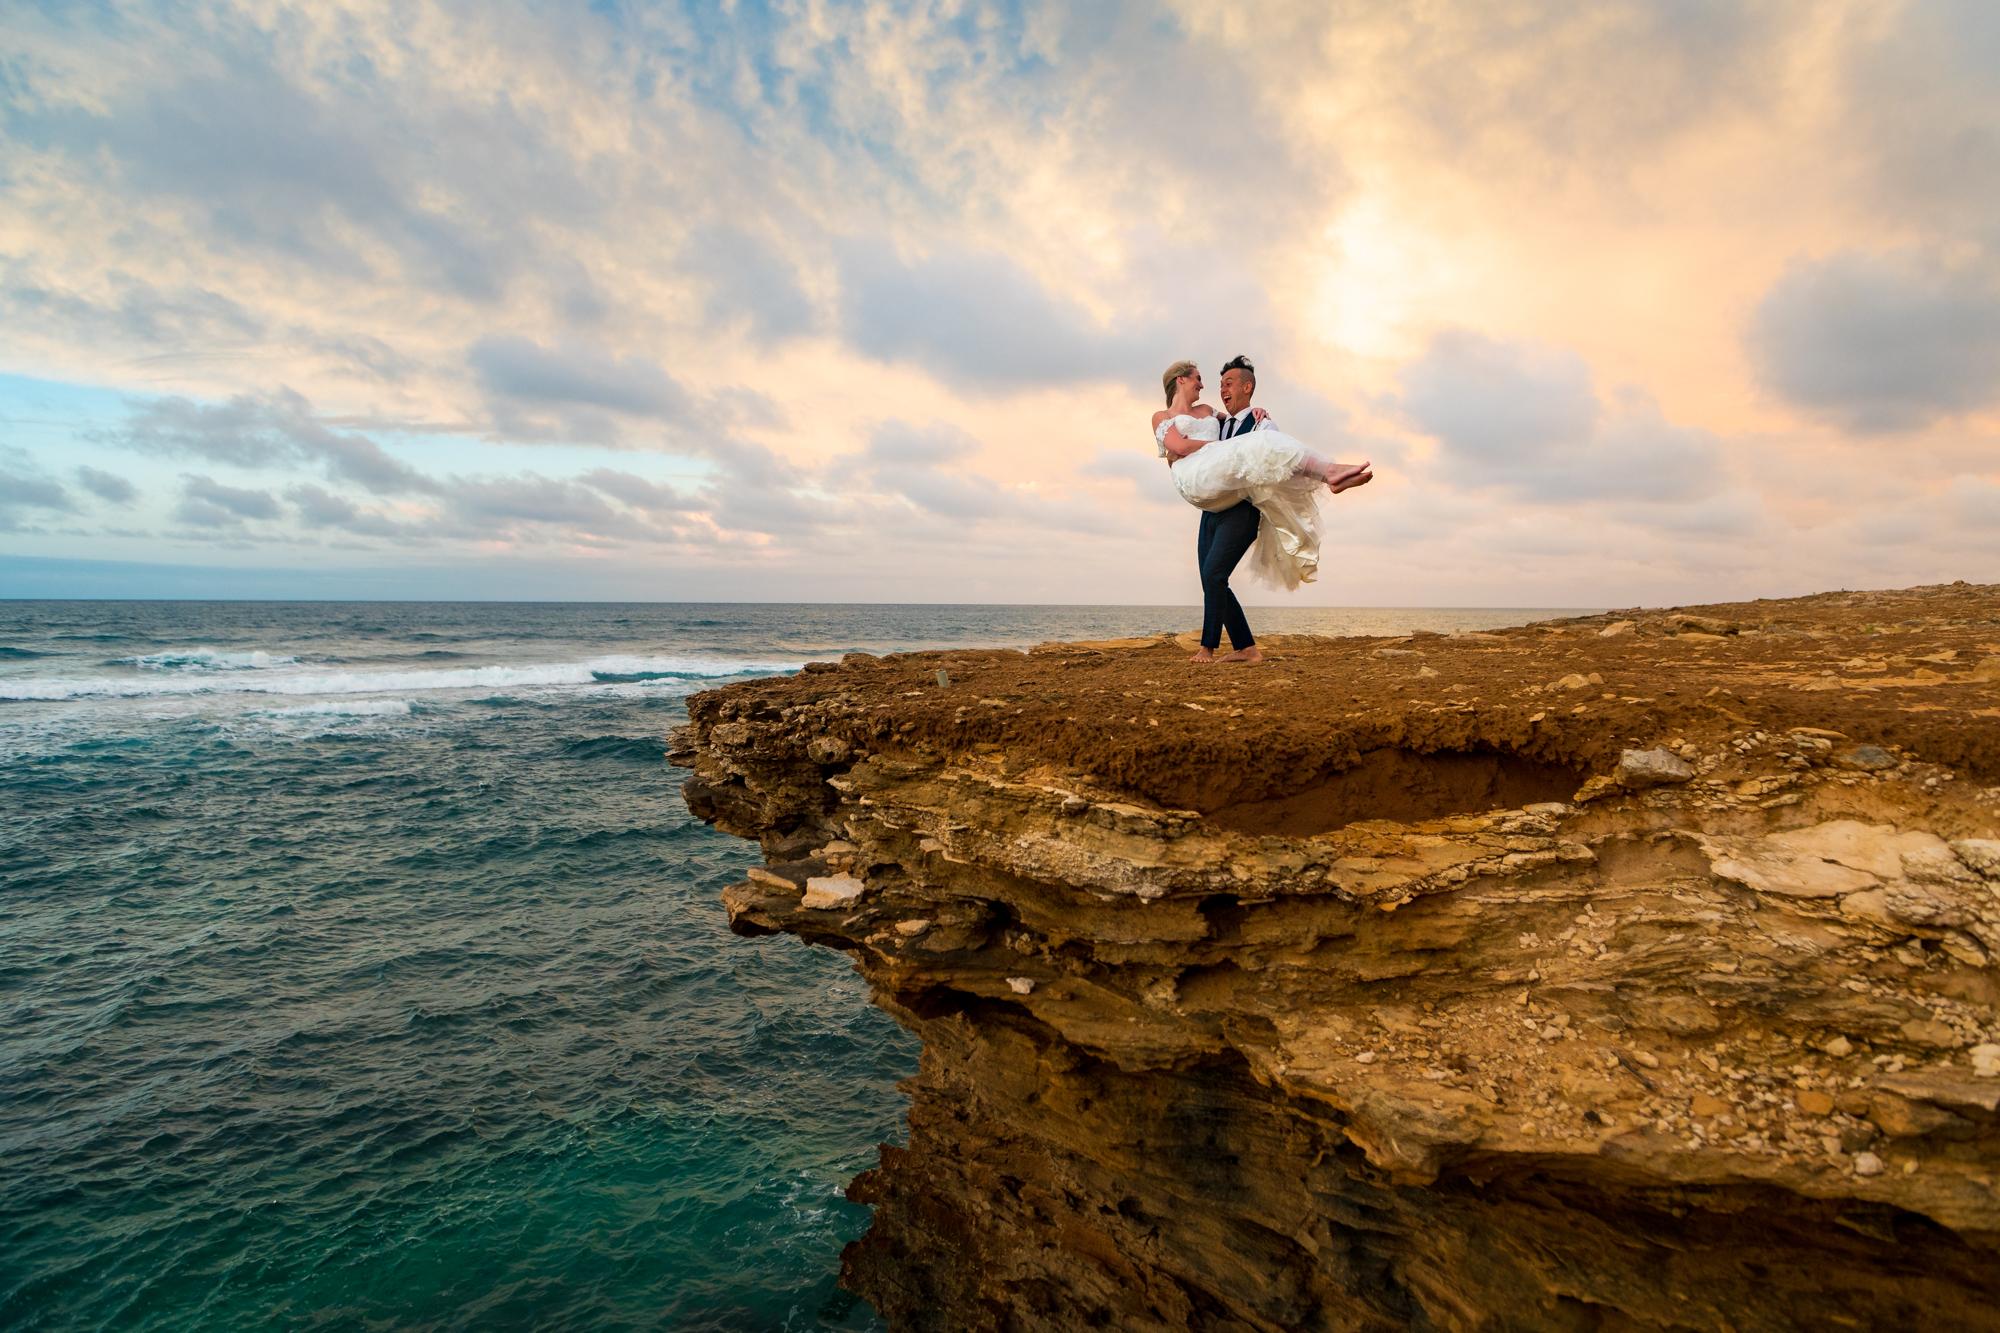 sunrise-wedding-coleen-shipwrecks-6-29-2919-9123 (1).jpg